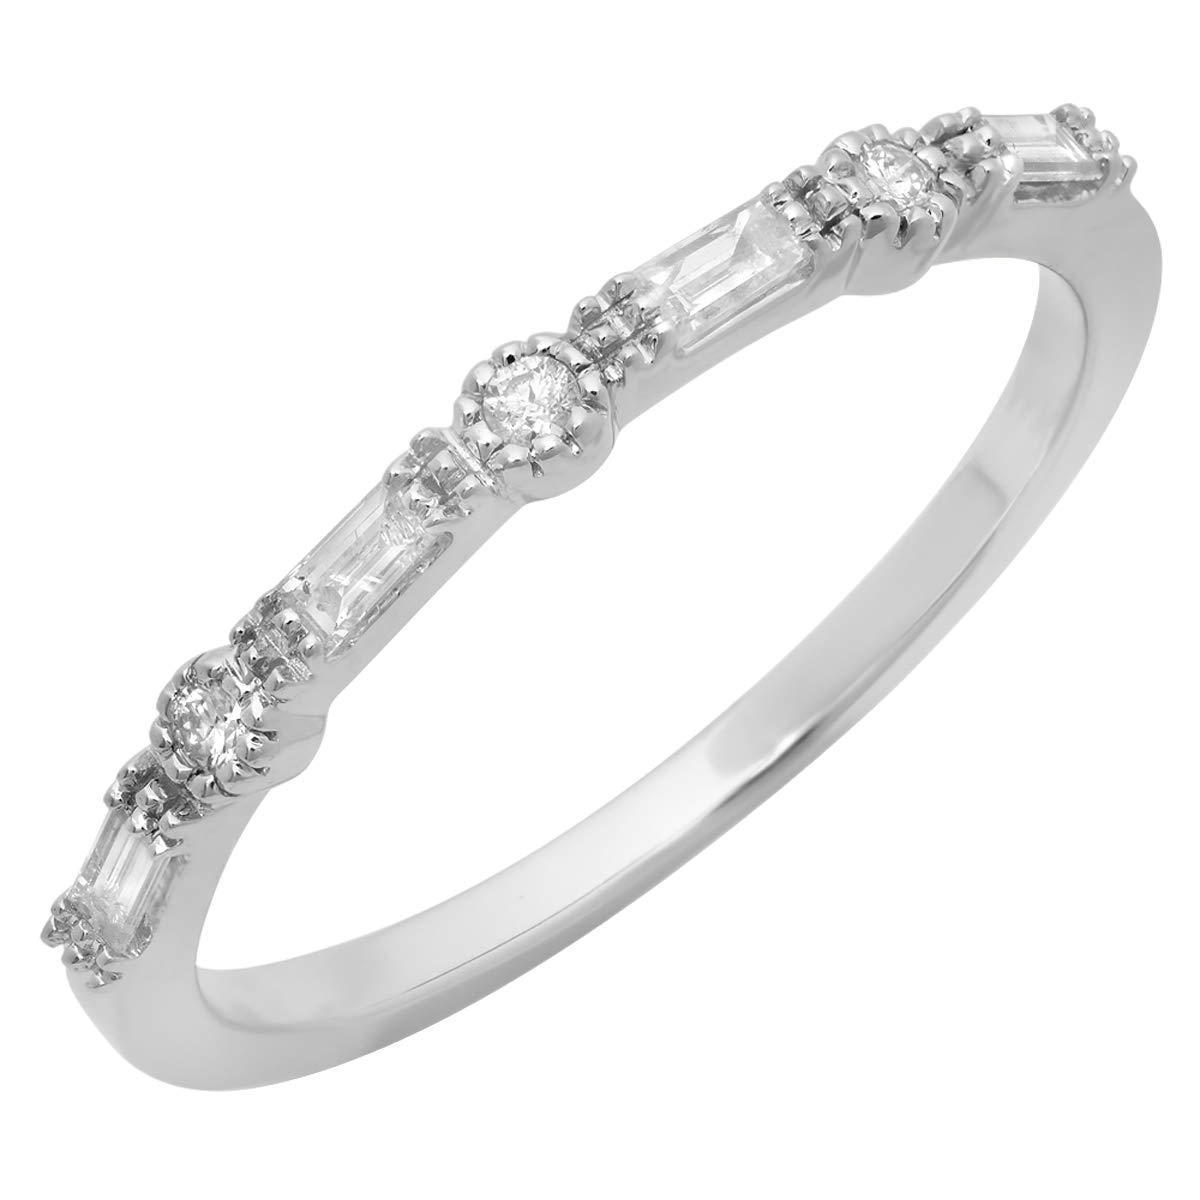 Dazzlingrock Collection 0.15 Carat (ctw) 10K Round & Baguette Diamond Ladies Anniversary Wedding Band, White Gold, Size 6.5 by Dazzlingrock Collection